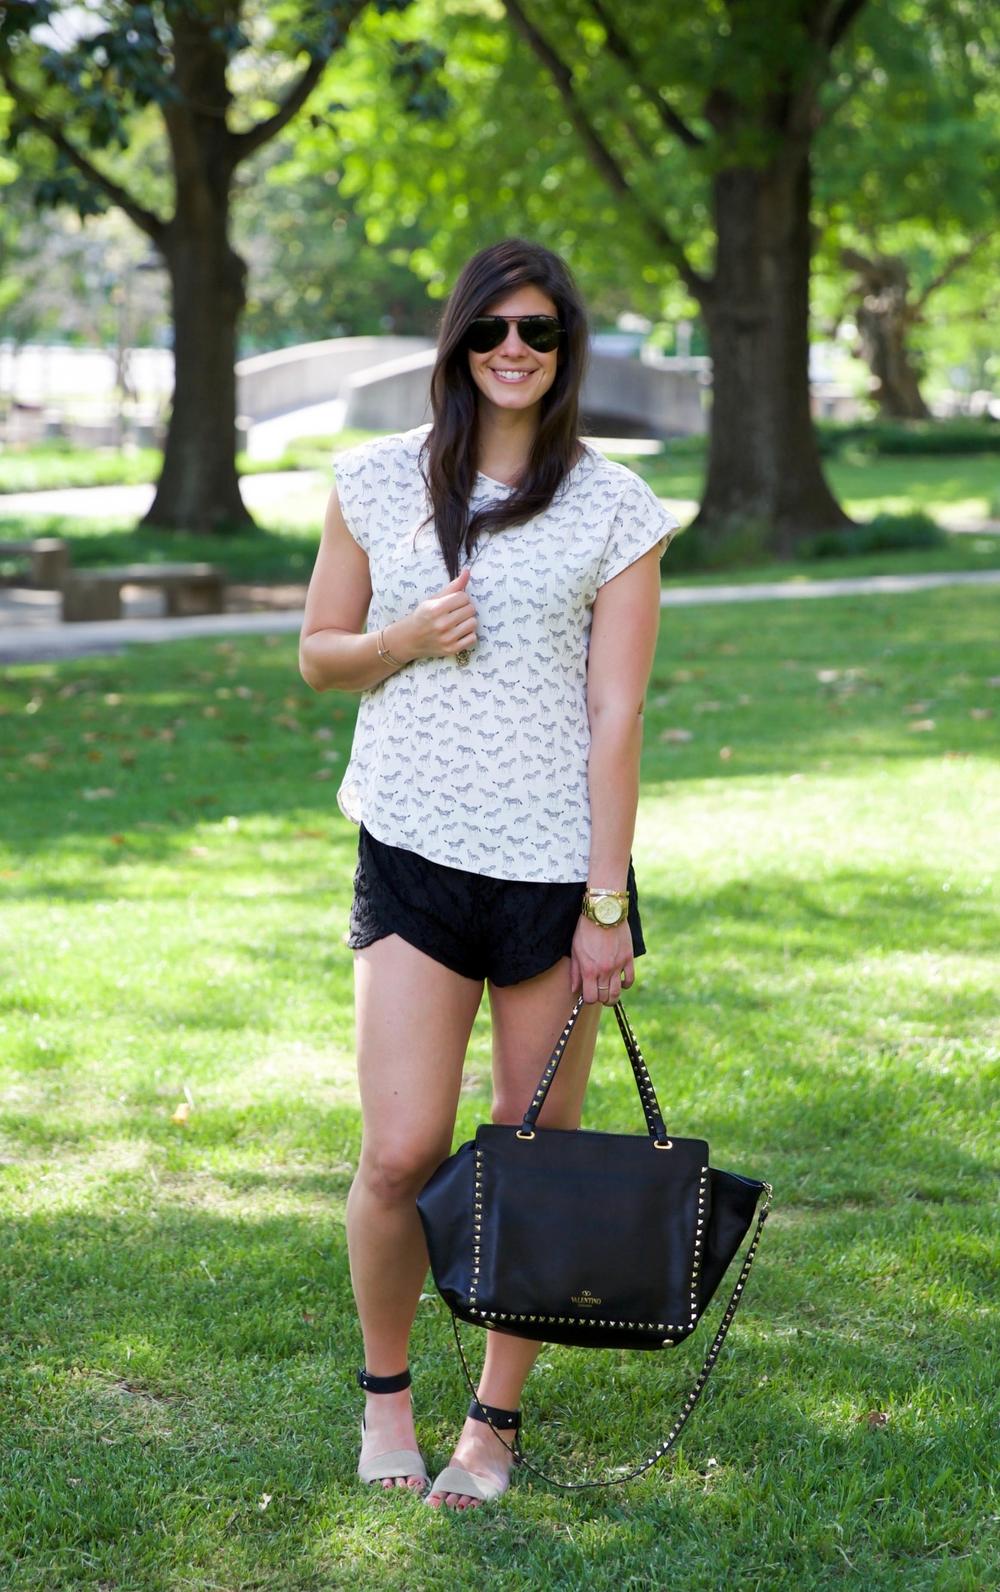 LaurenSchwaiger-Life-Style-Blog-OOTD-Summer-Style-Zebra-Blouse.jpg